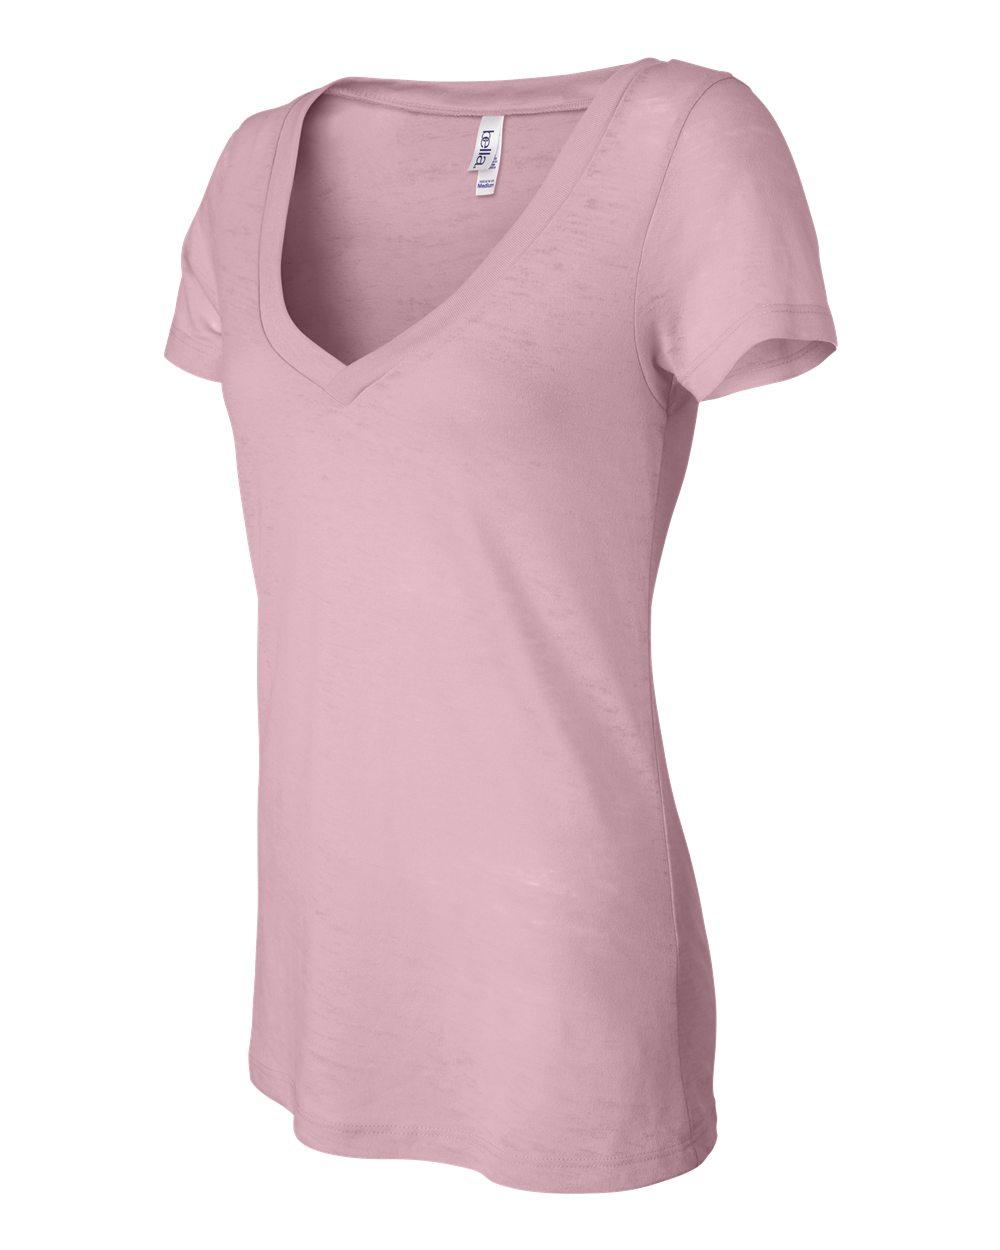 Bella 8605 Soft Pink